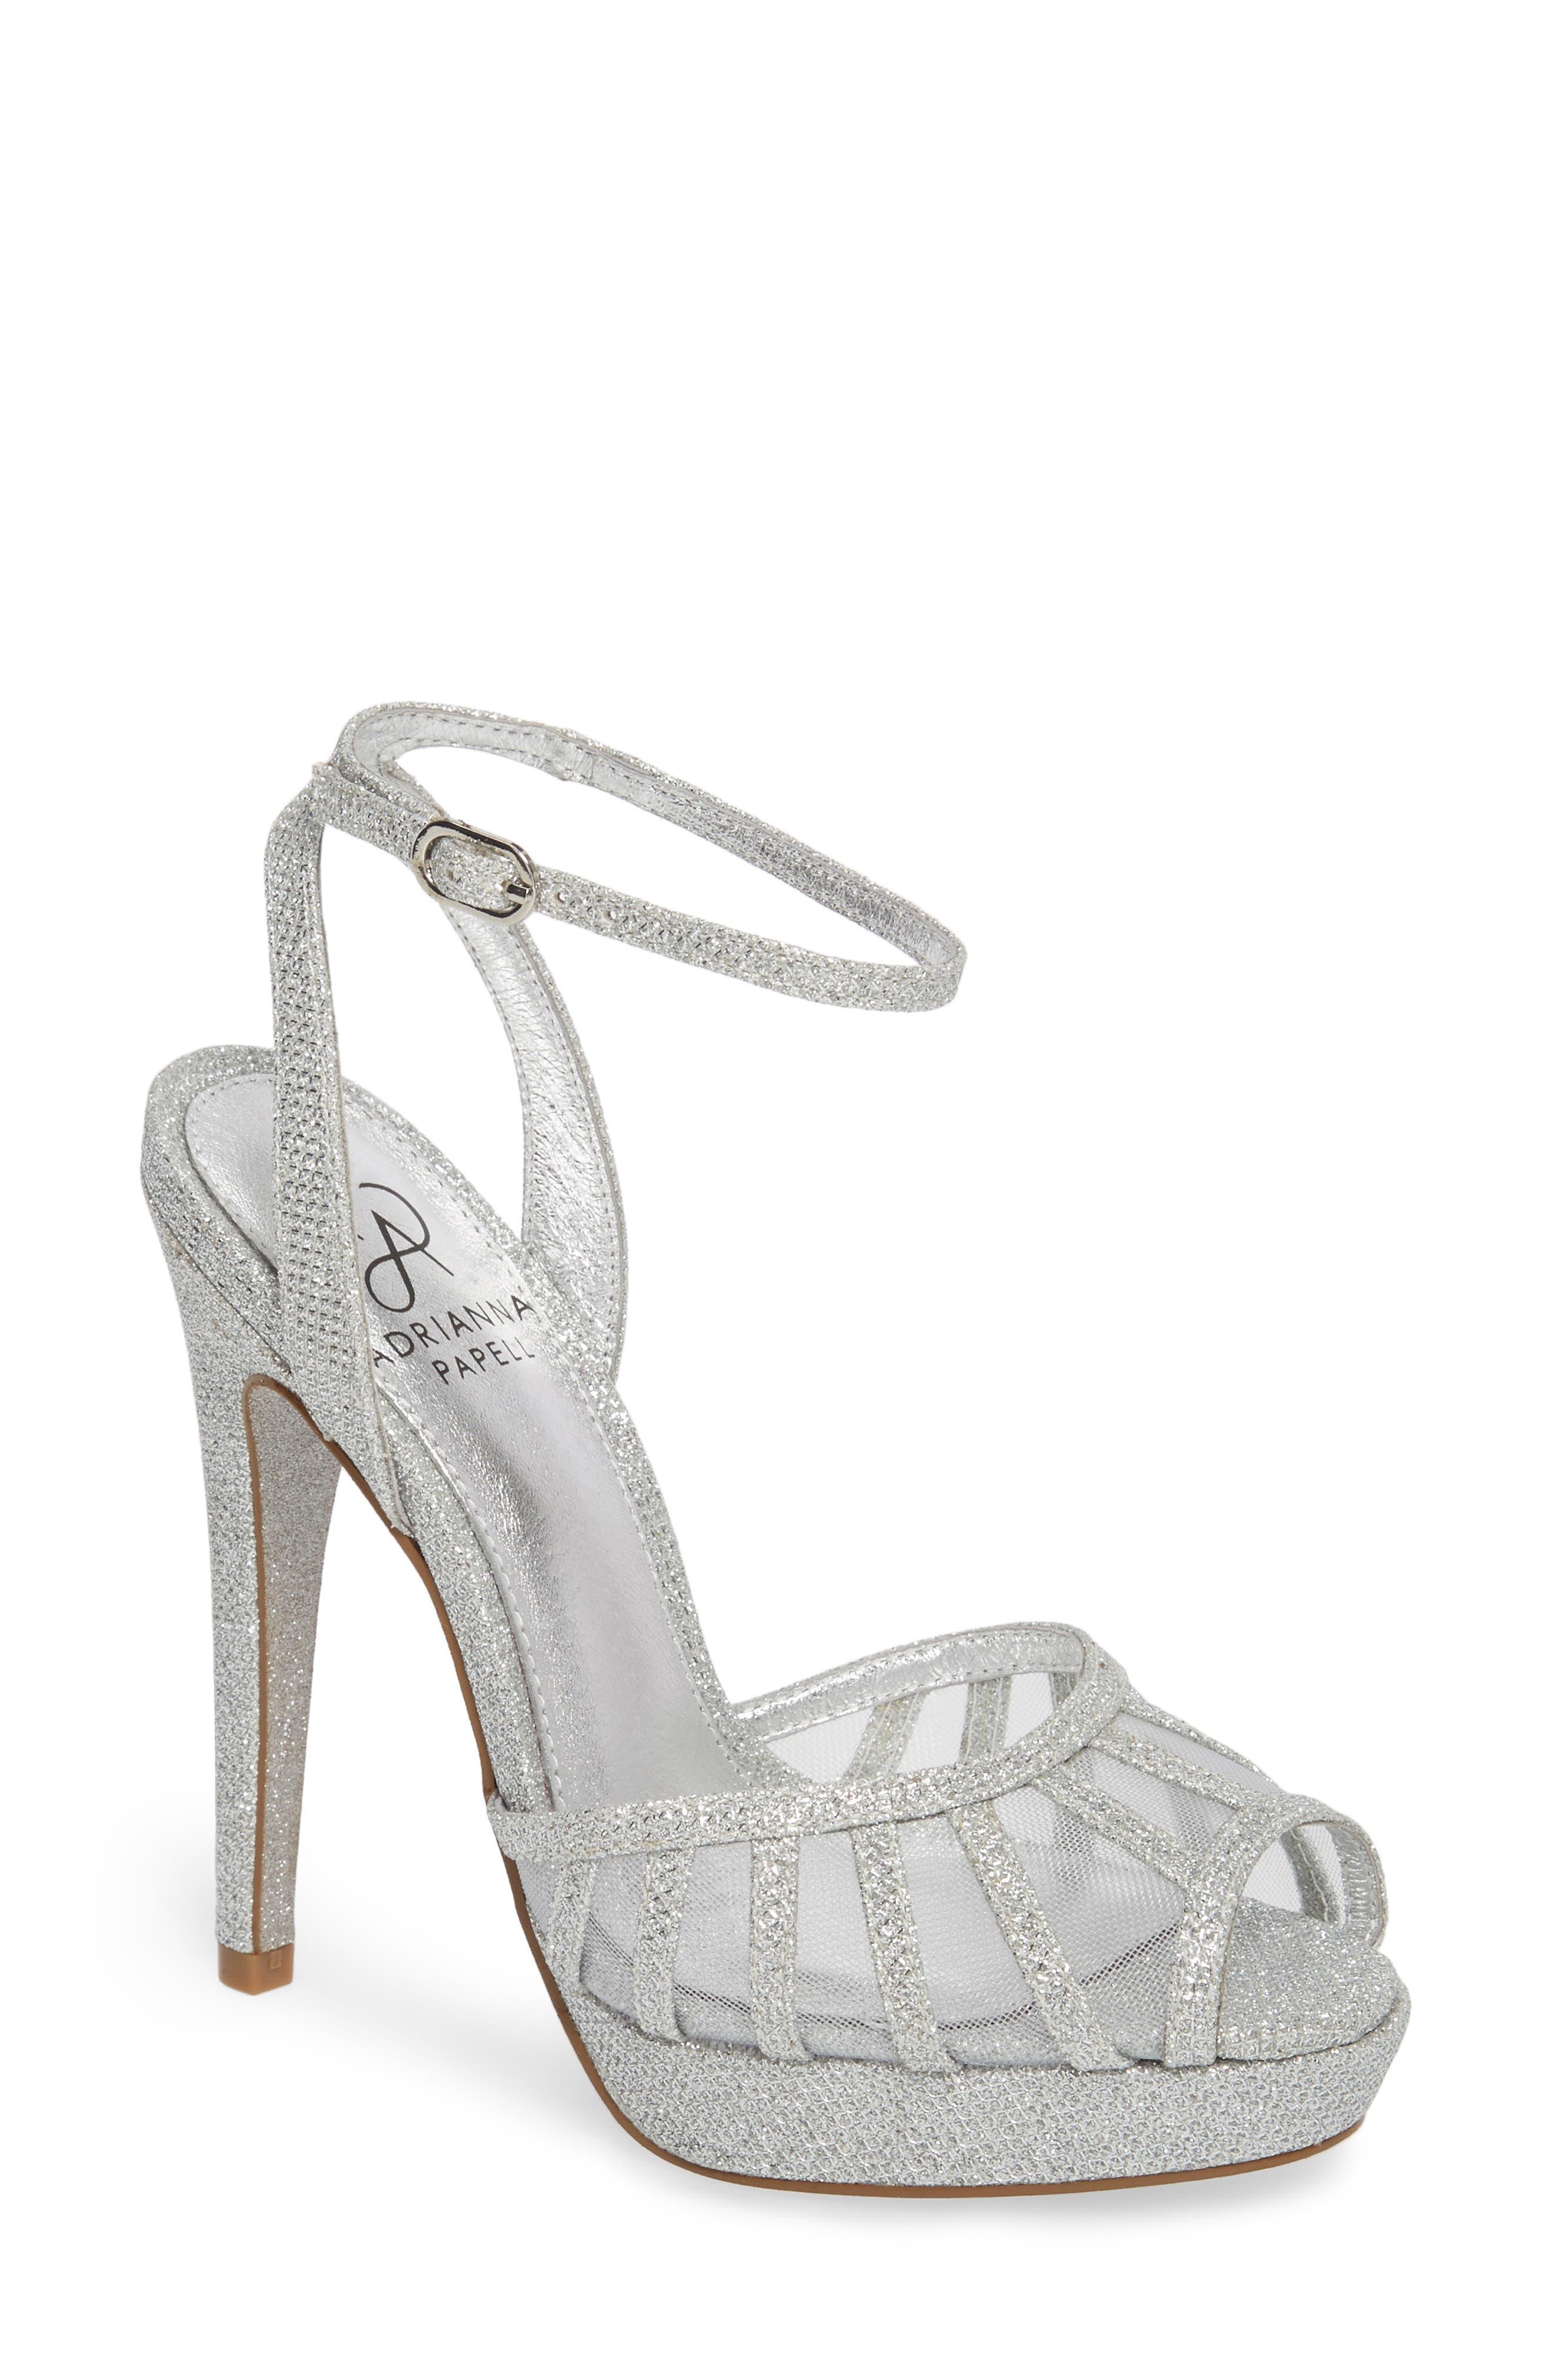 Main Image - Adrianna Papell Saida Platform Sandal (Women)